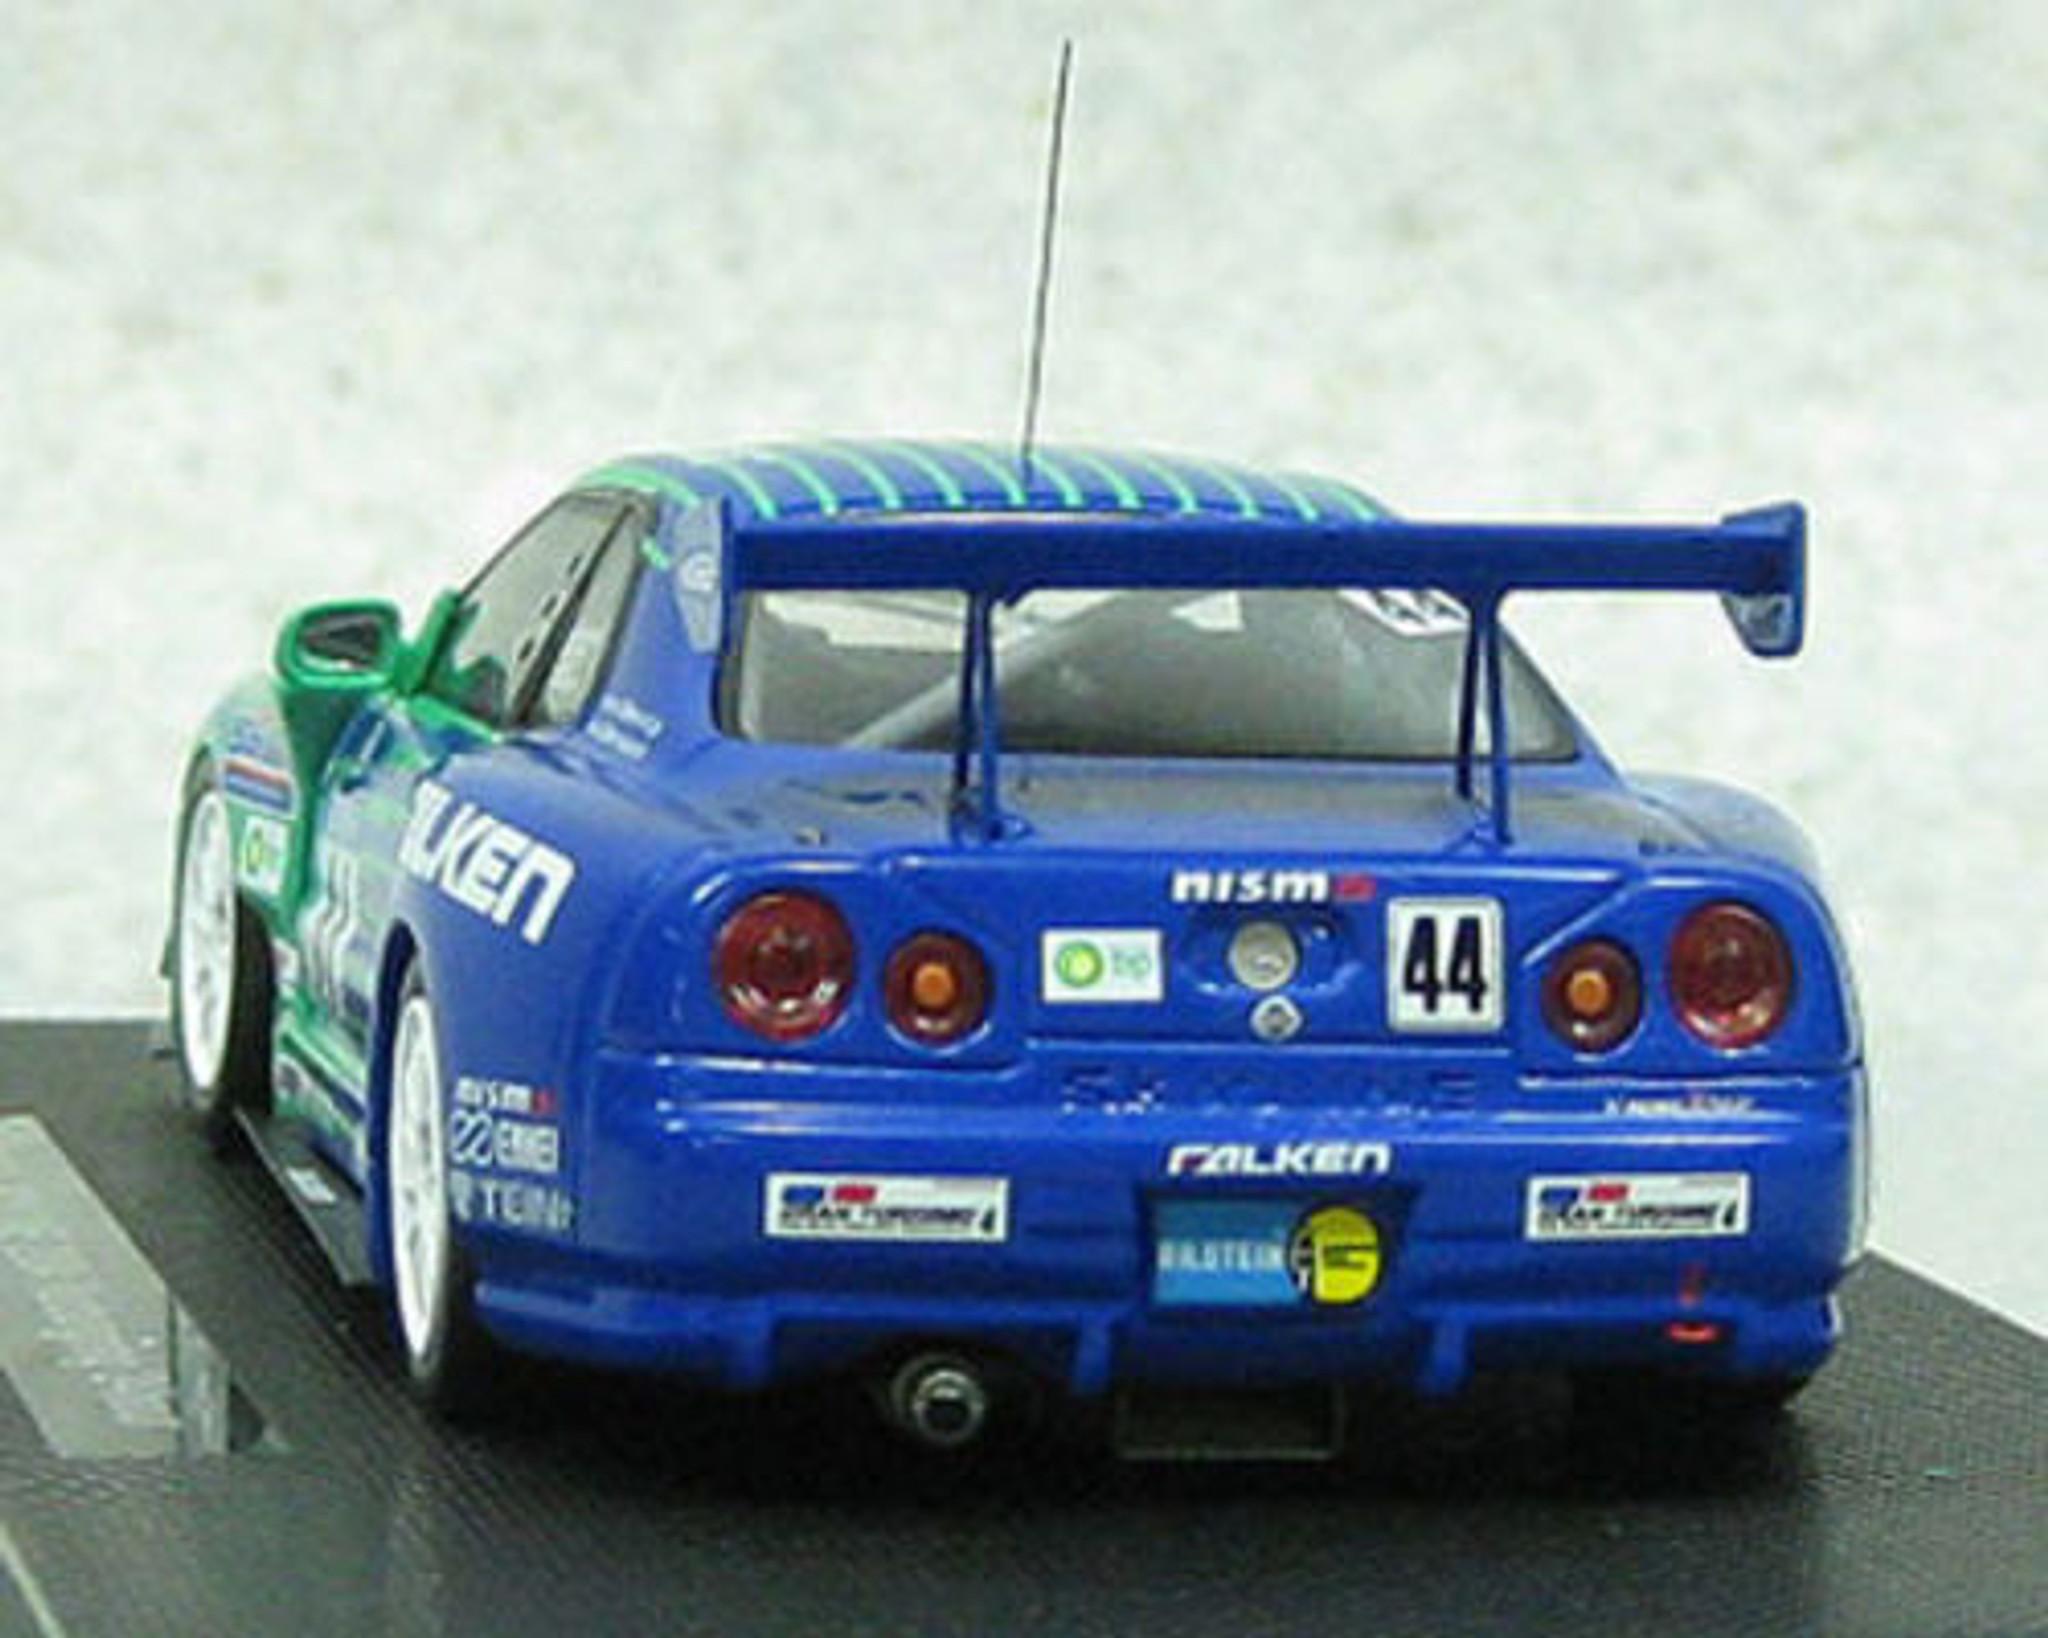 Ebbro 44481 FALKEN Nissan Skyline GT-R R34 # 44 Nurburgring 24H 1/43 Scale